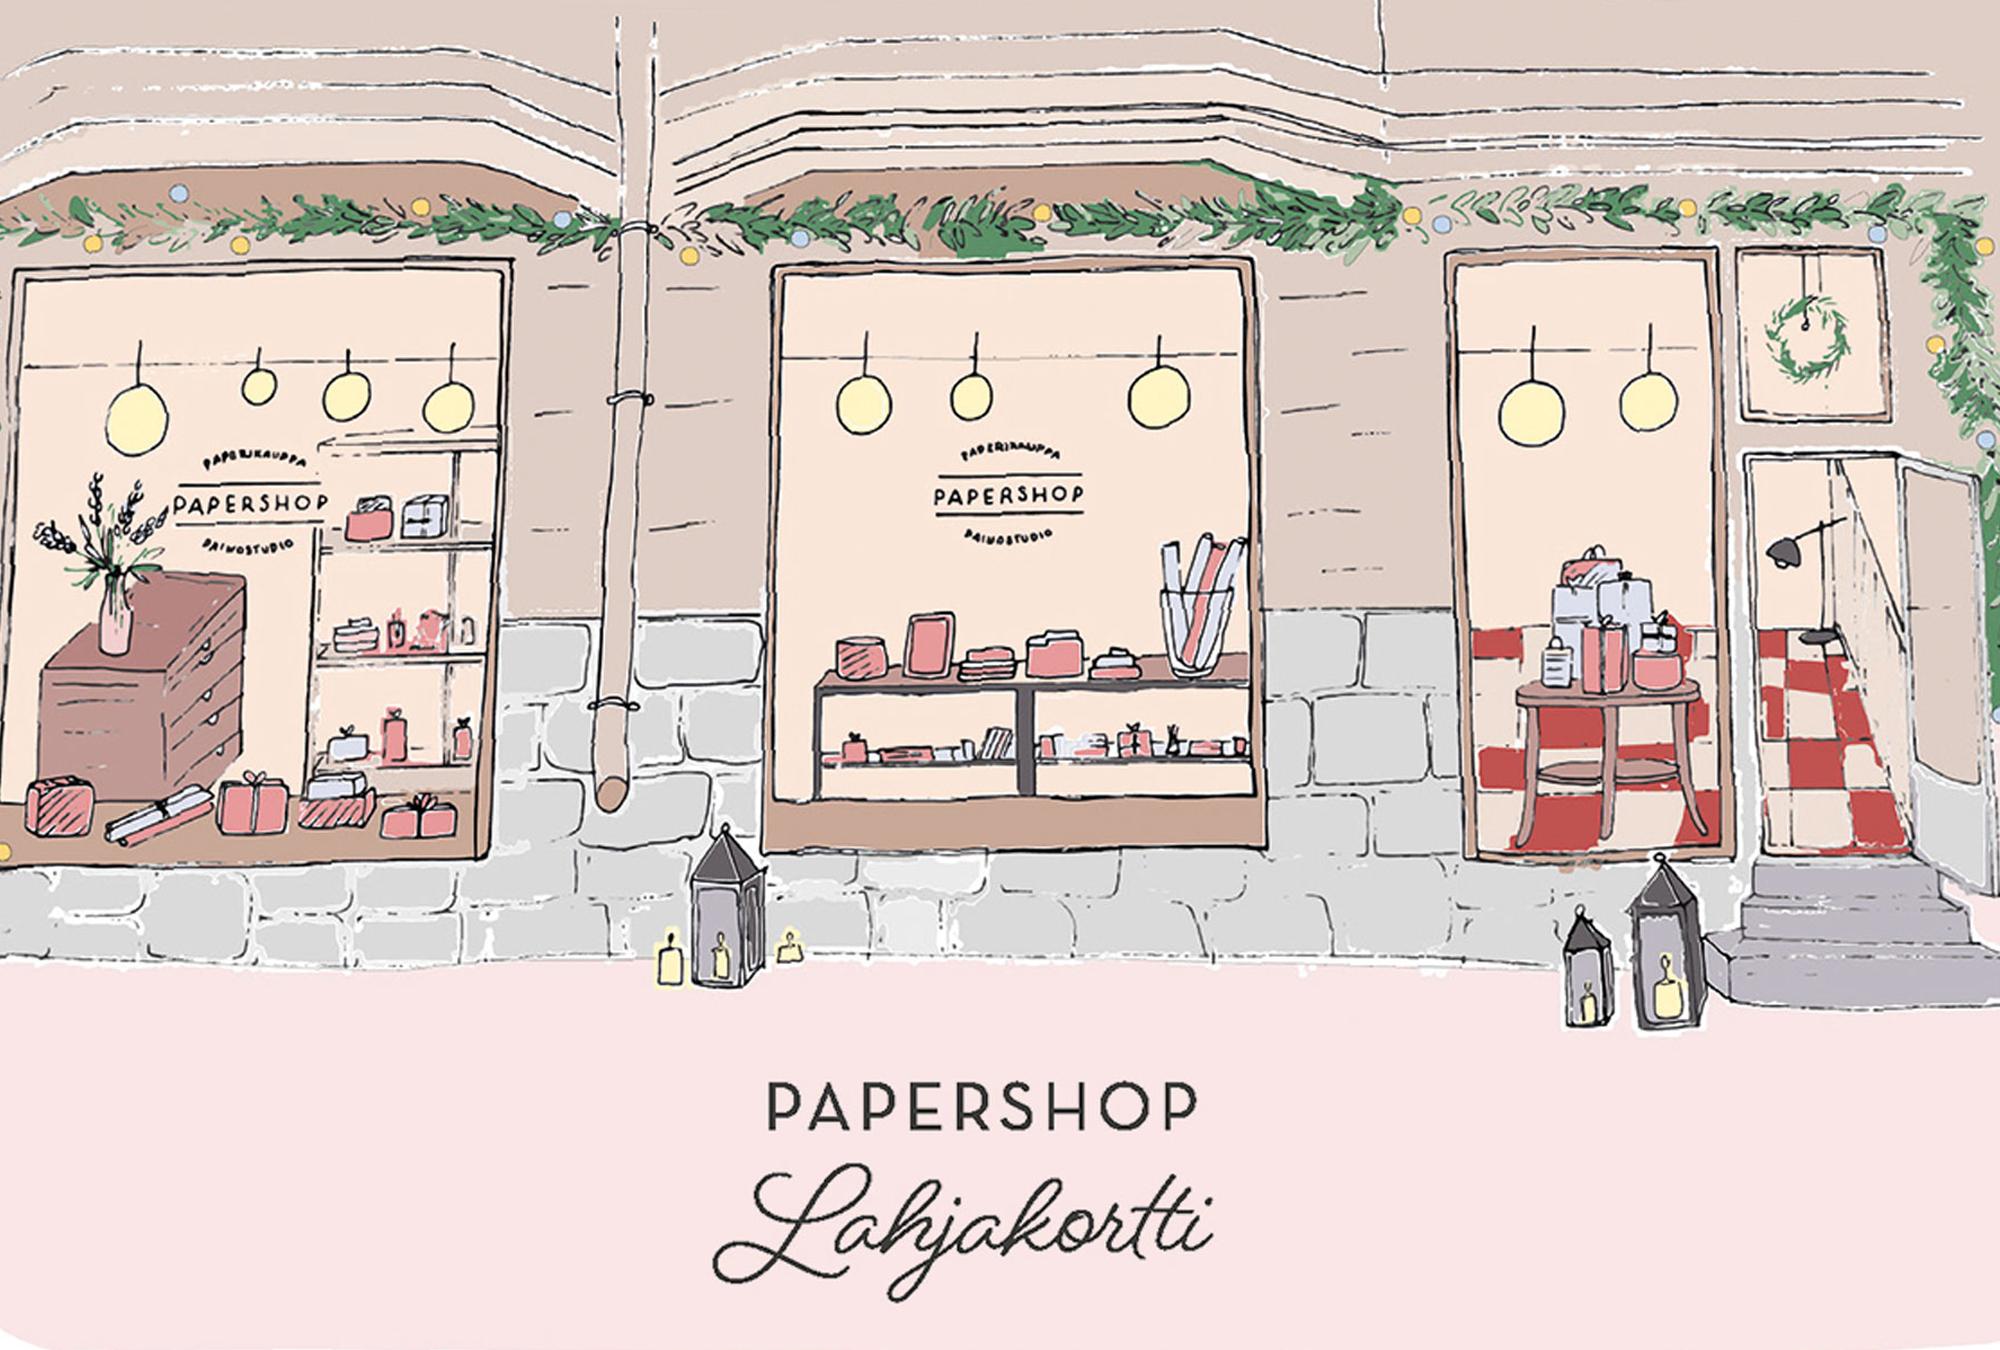 Papershop_Helsinki_Lahjakortti_Gift_Card_kansikuva_cover_photo